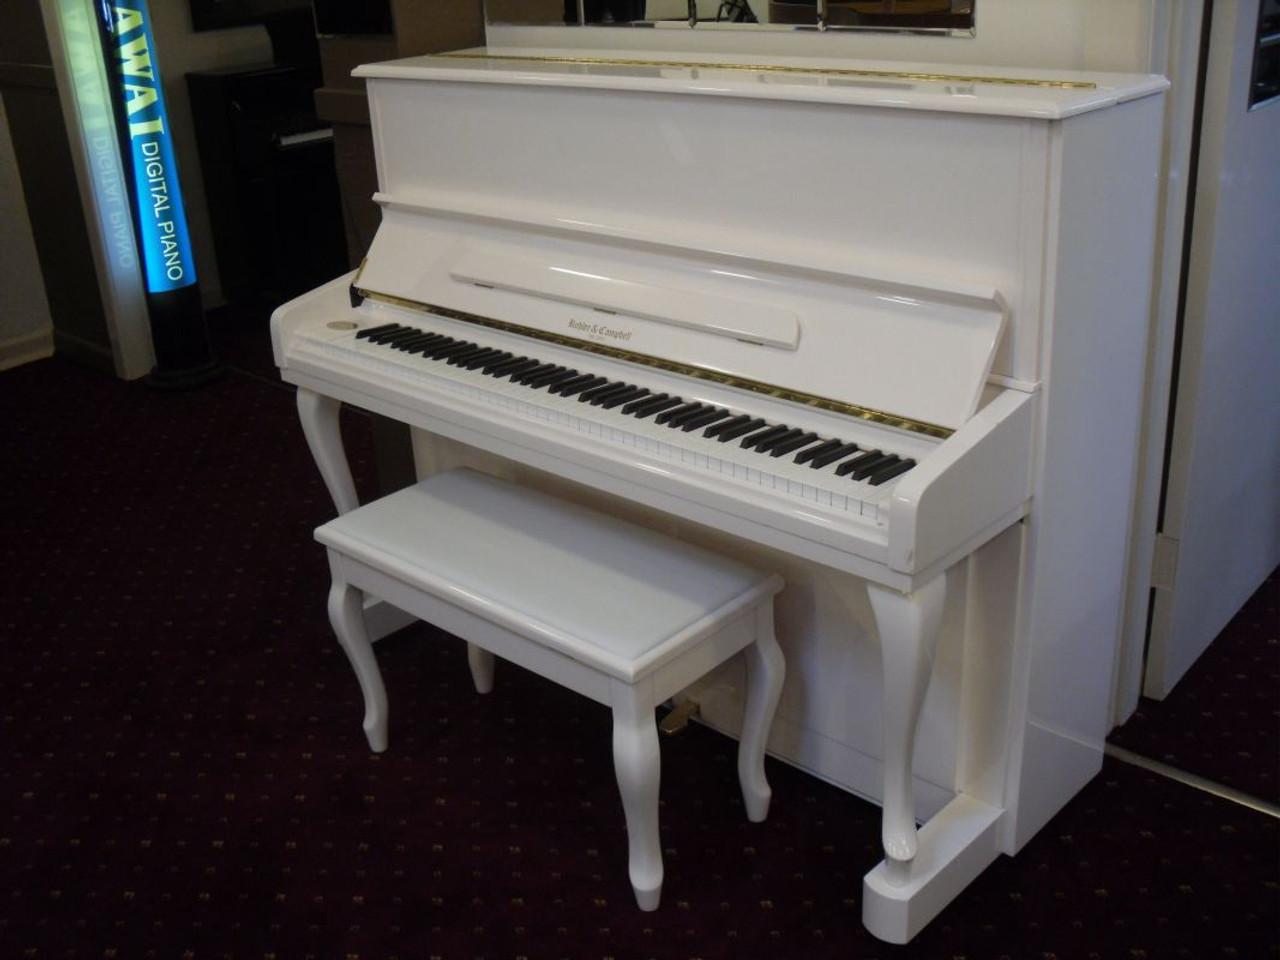 Kohler & Campbell KC121FD Upright Piano